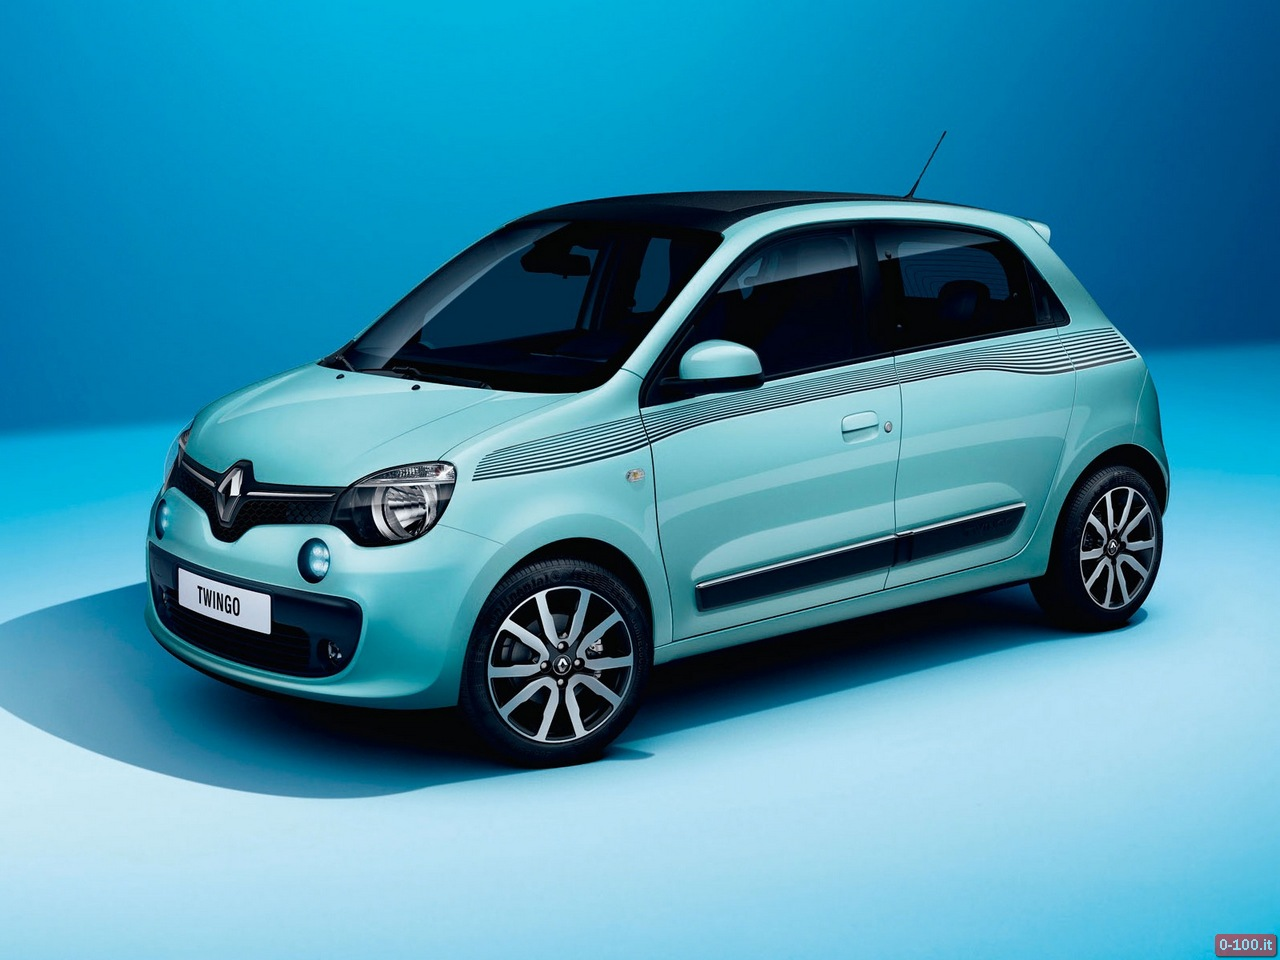 geneve-2014-renault-twingo-motore-posteriore-prezzo-0-100_14